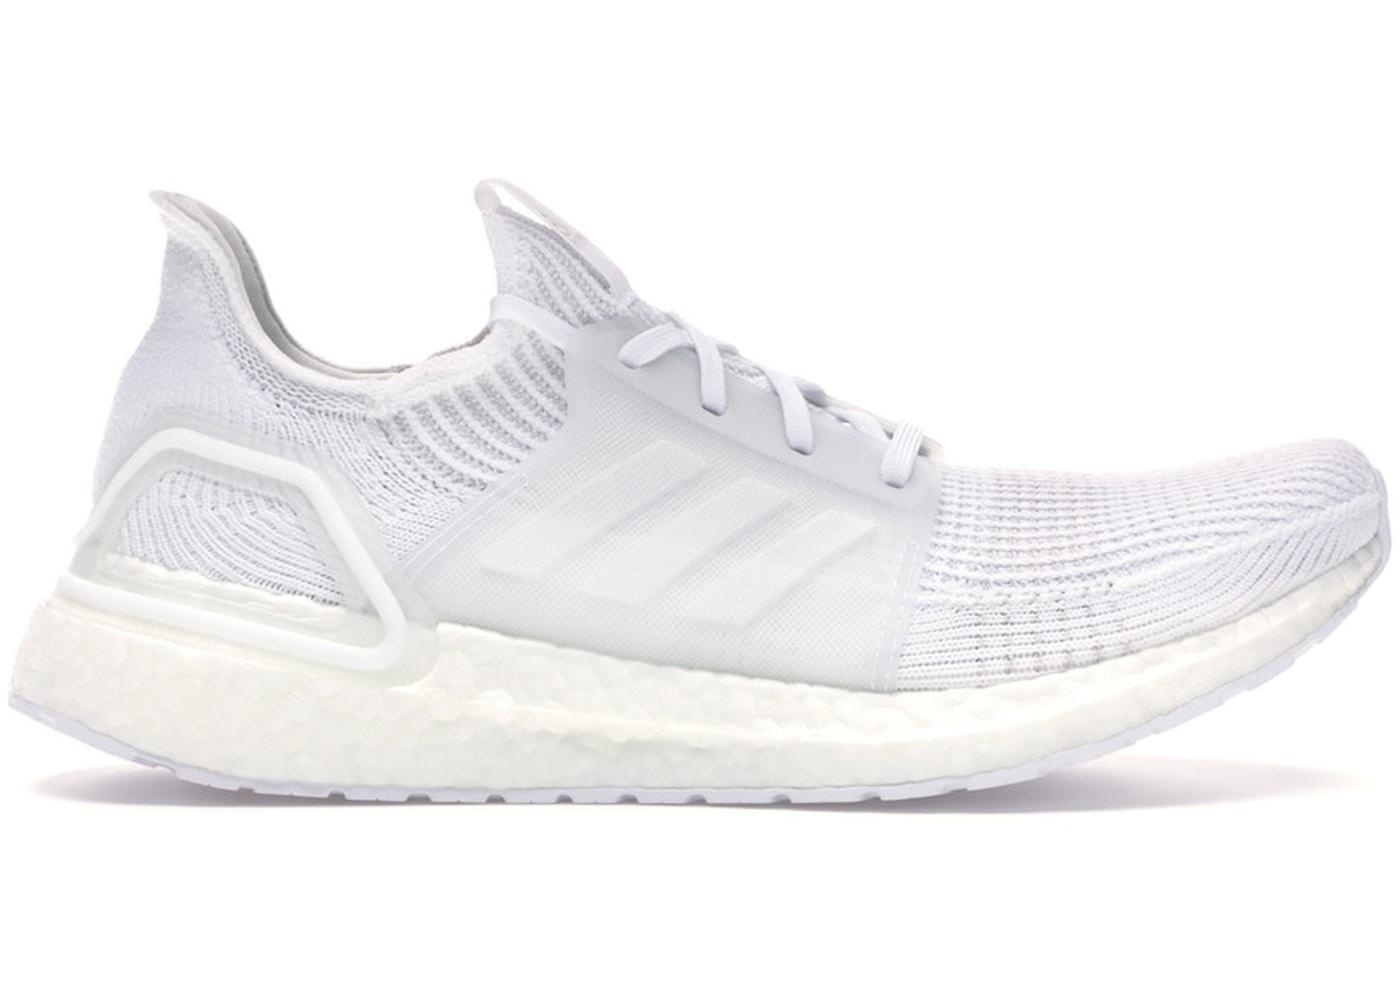 wholesale dealer d1564 24320 Buy adidas Ultra Boost Shoes & Deadstock Sneakers